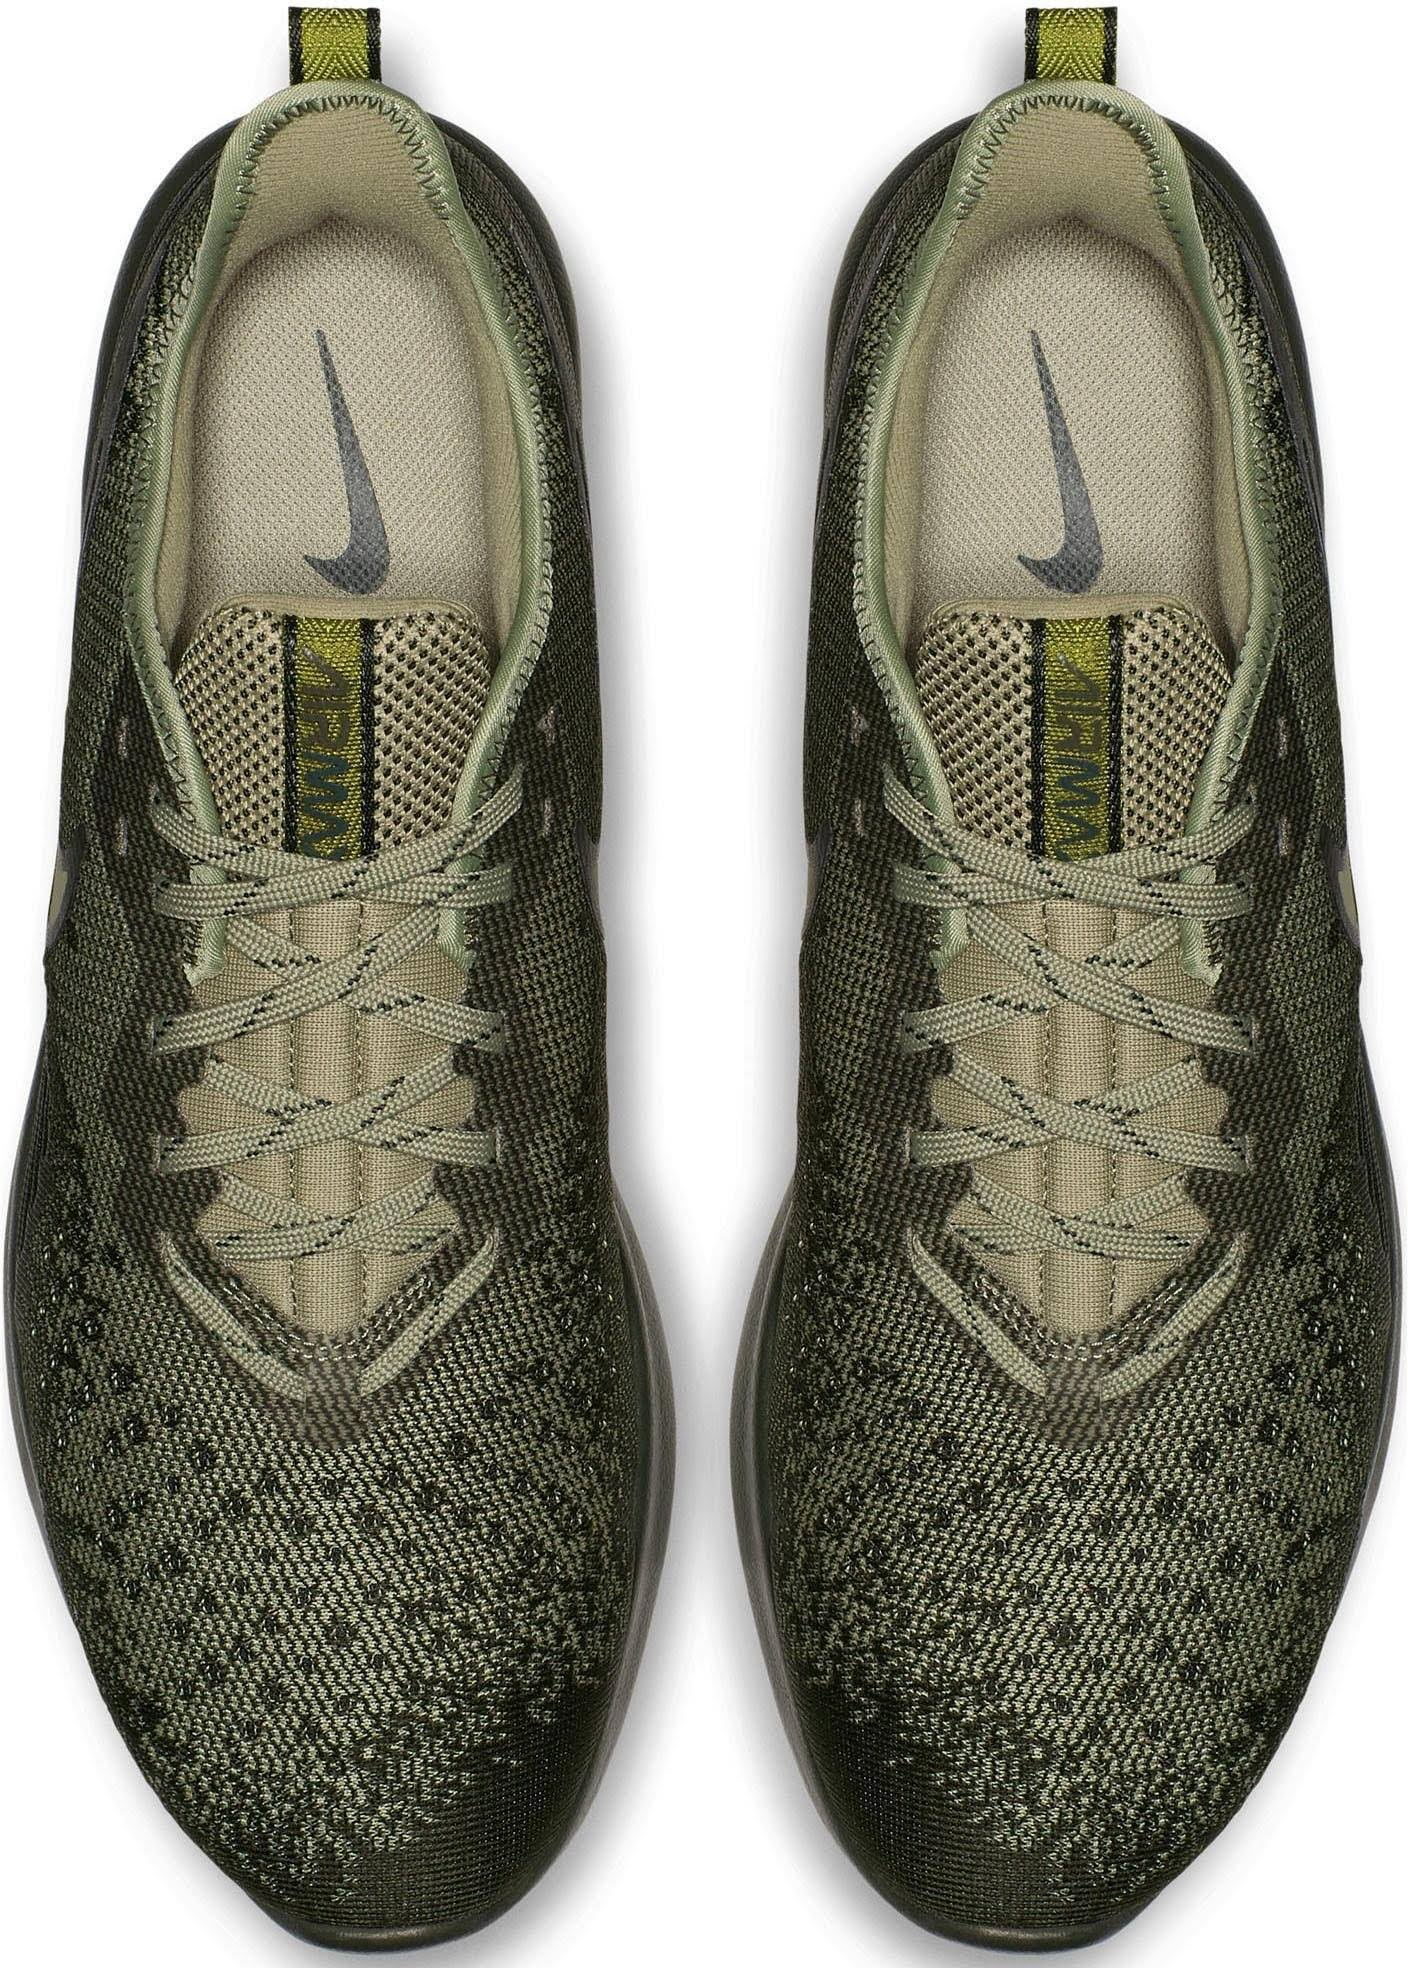 4 Groen Sequent Air Max Olive Herenschoen Nike 1q7tzww